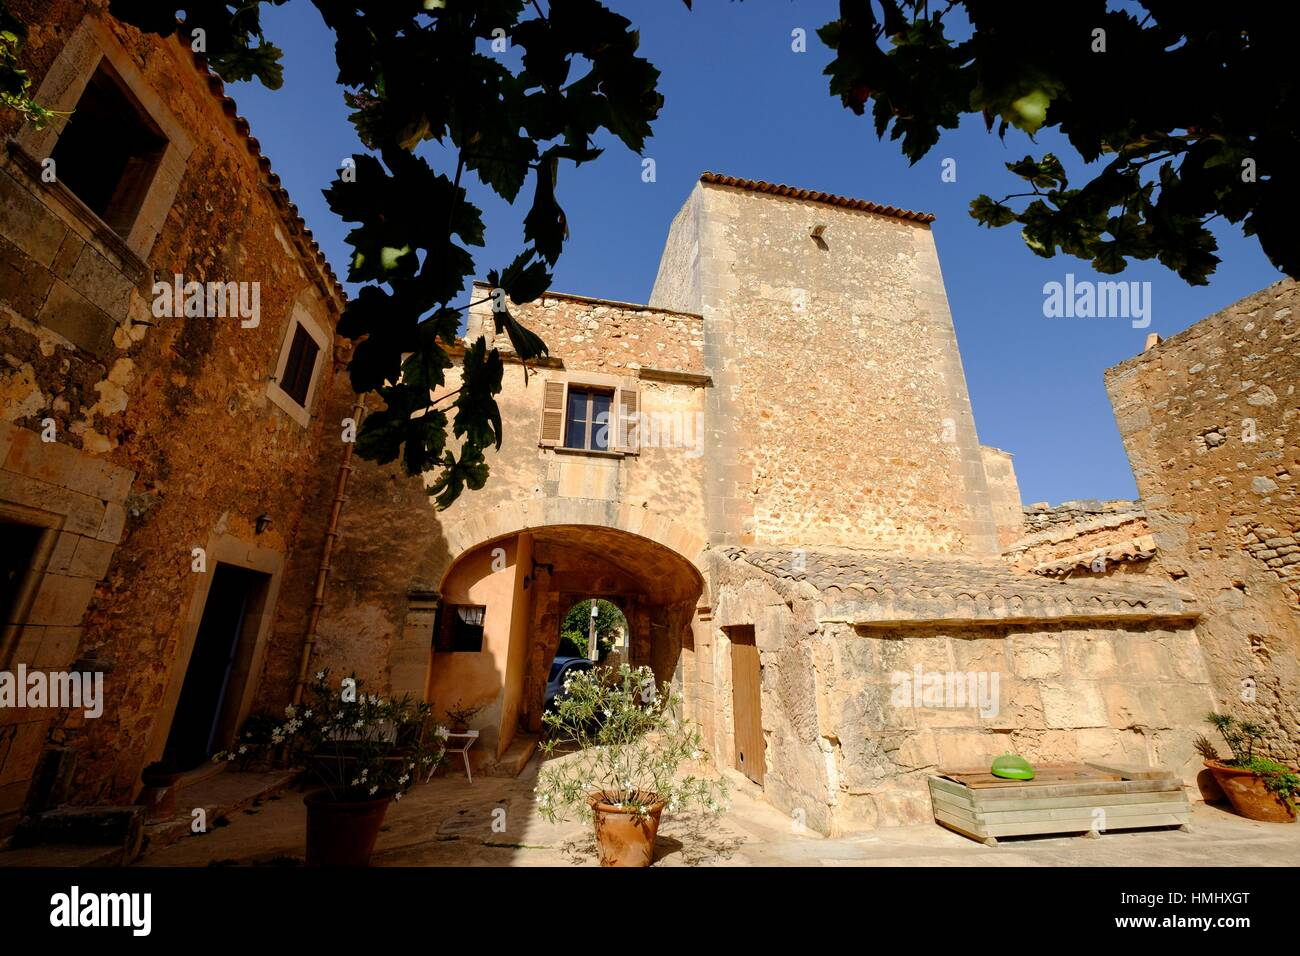 Son Amer, casa fortificada del siglo XVI, Es Llombarts, Majorca, Balearic Islands, Spain - Stock Image